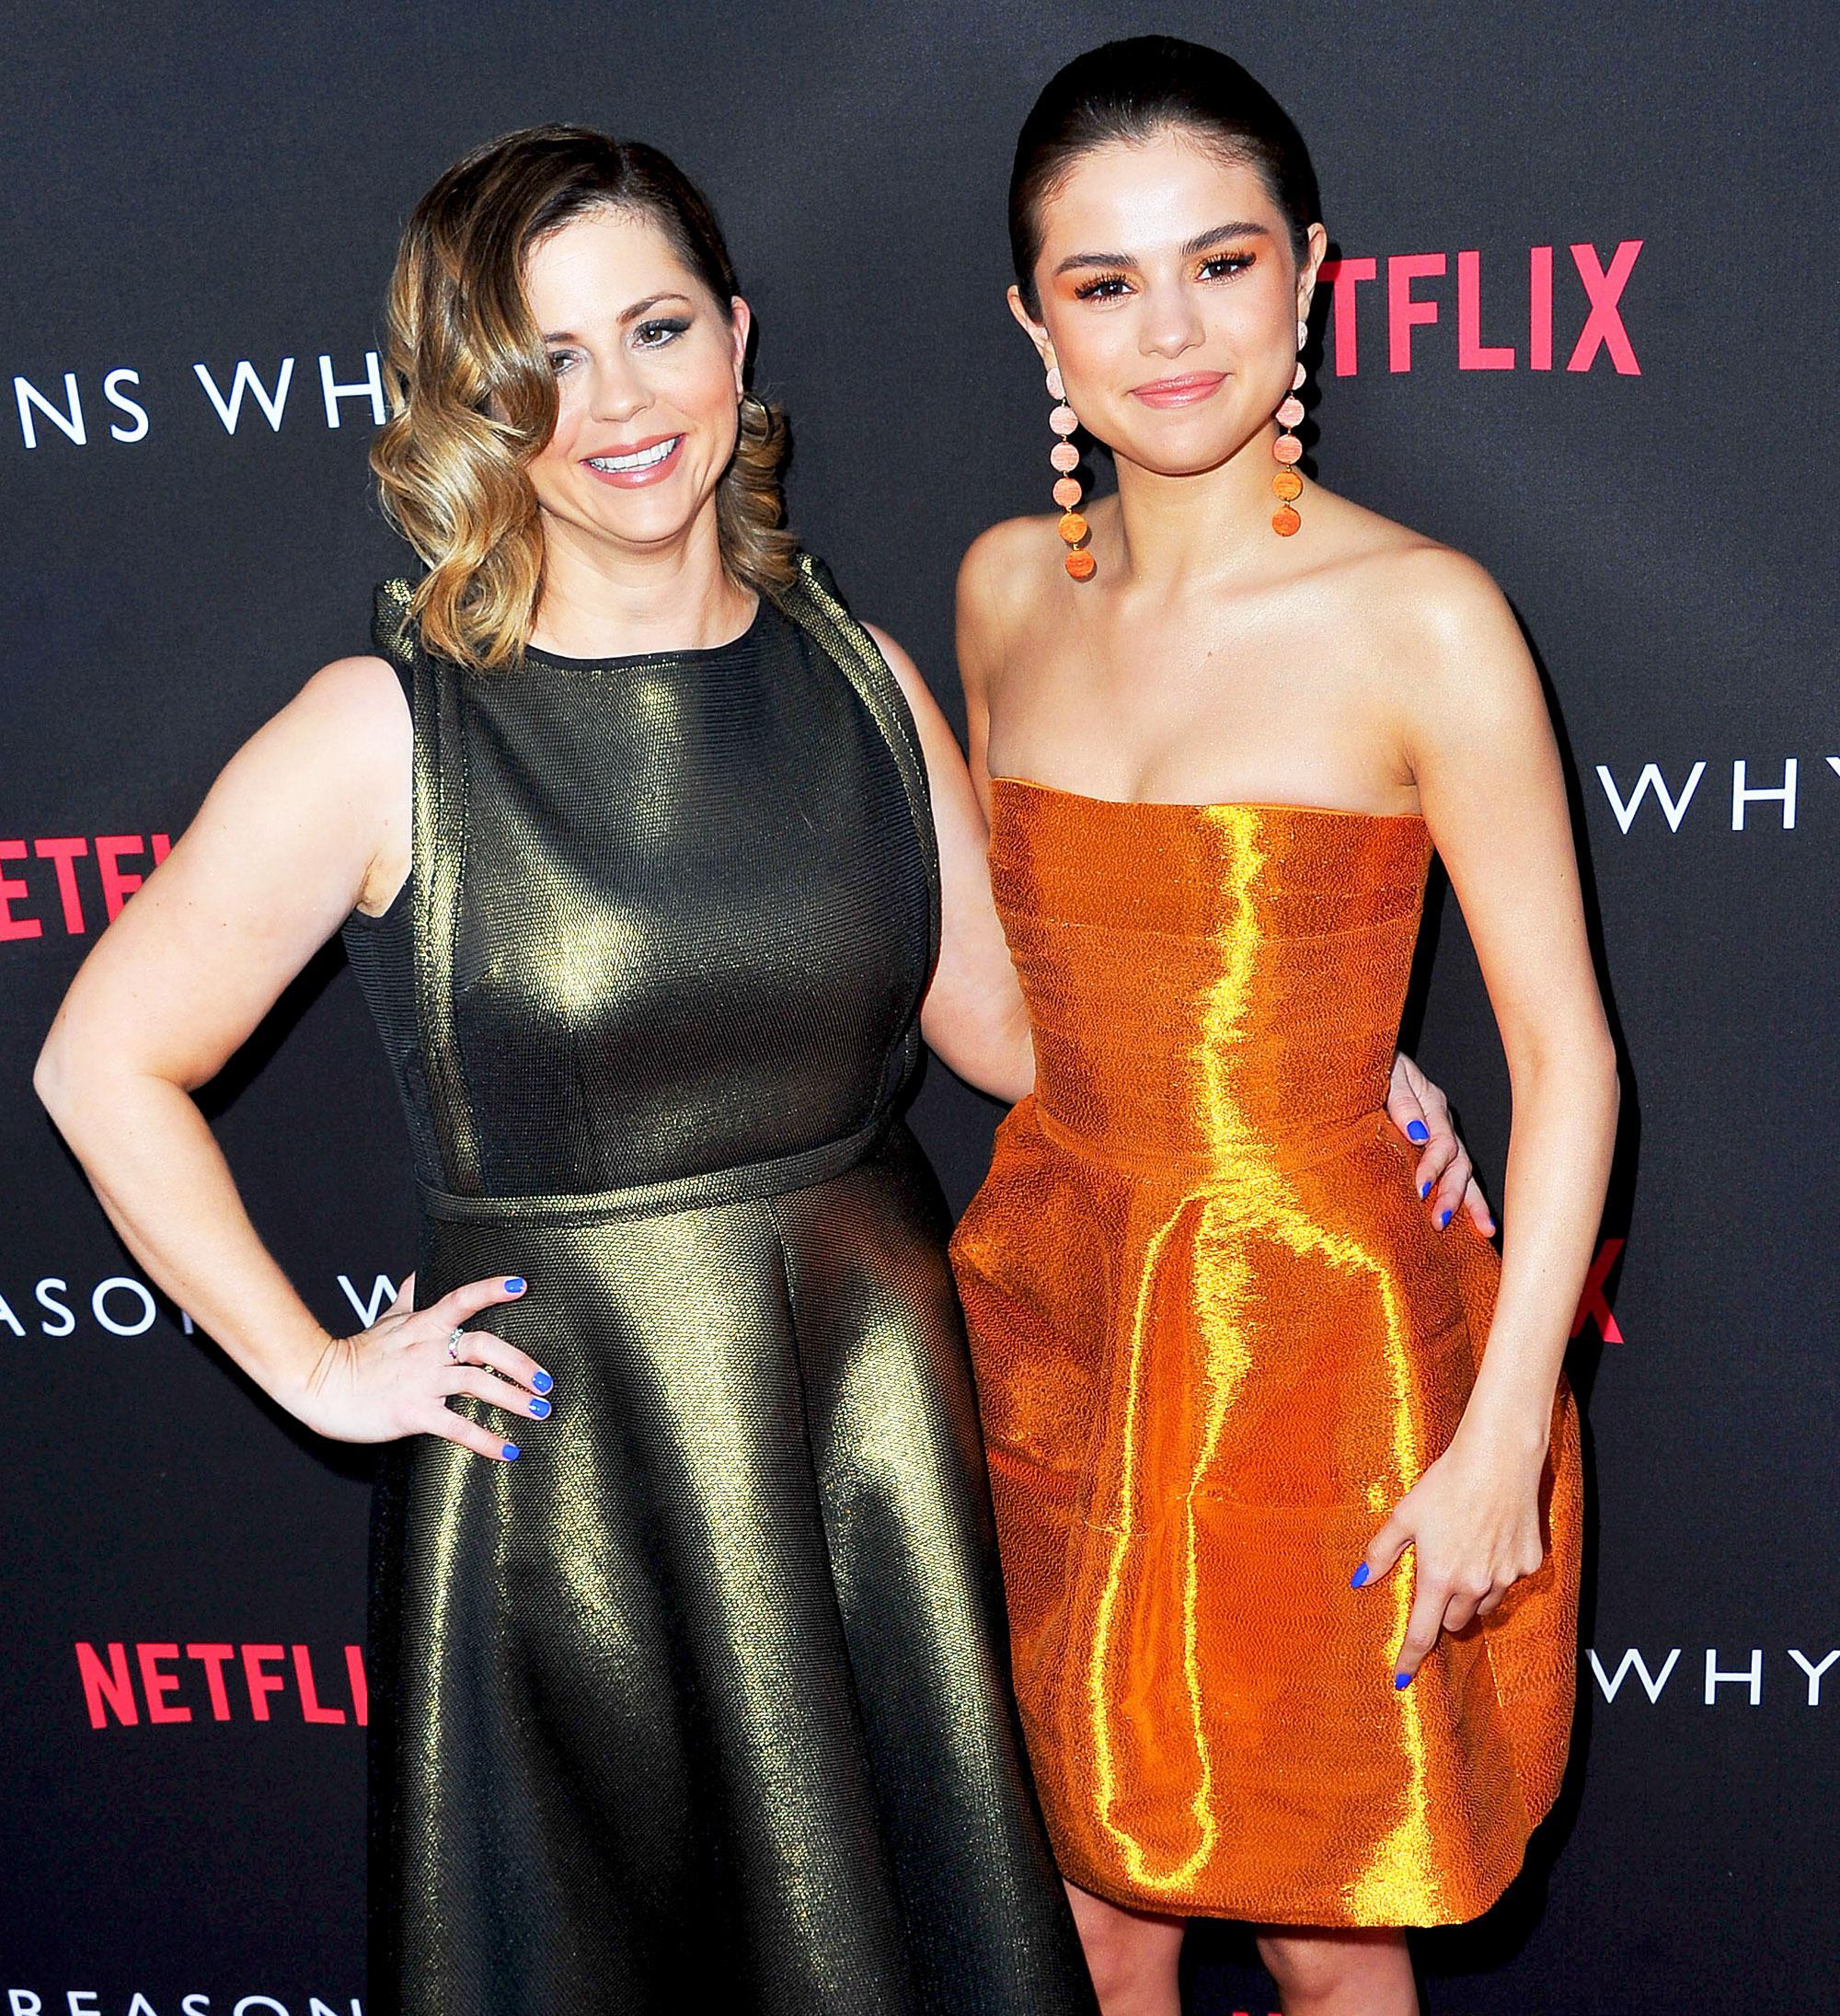 Selena Gomez and Mandy Teefey